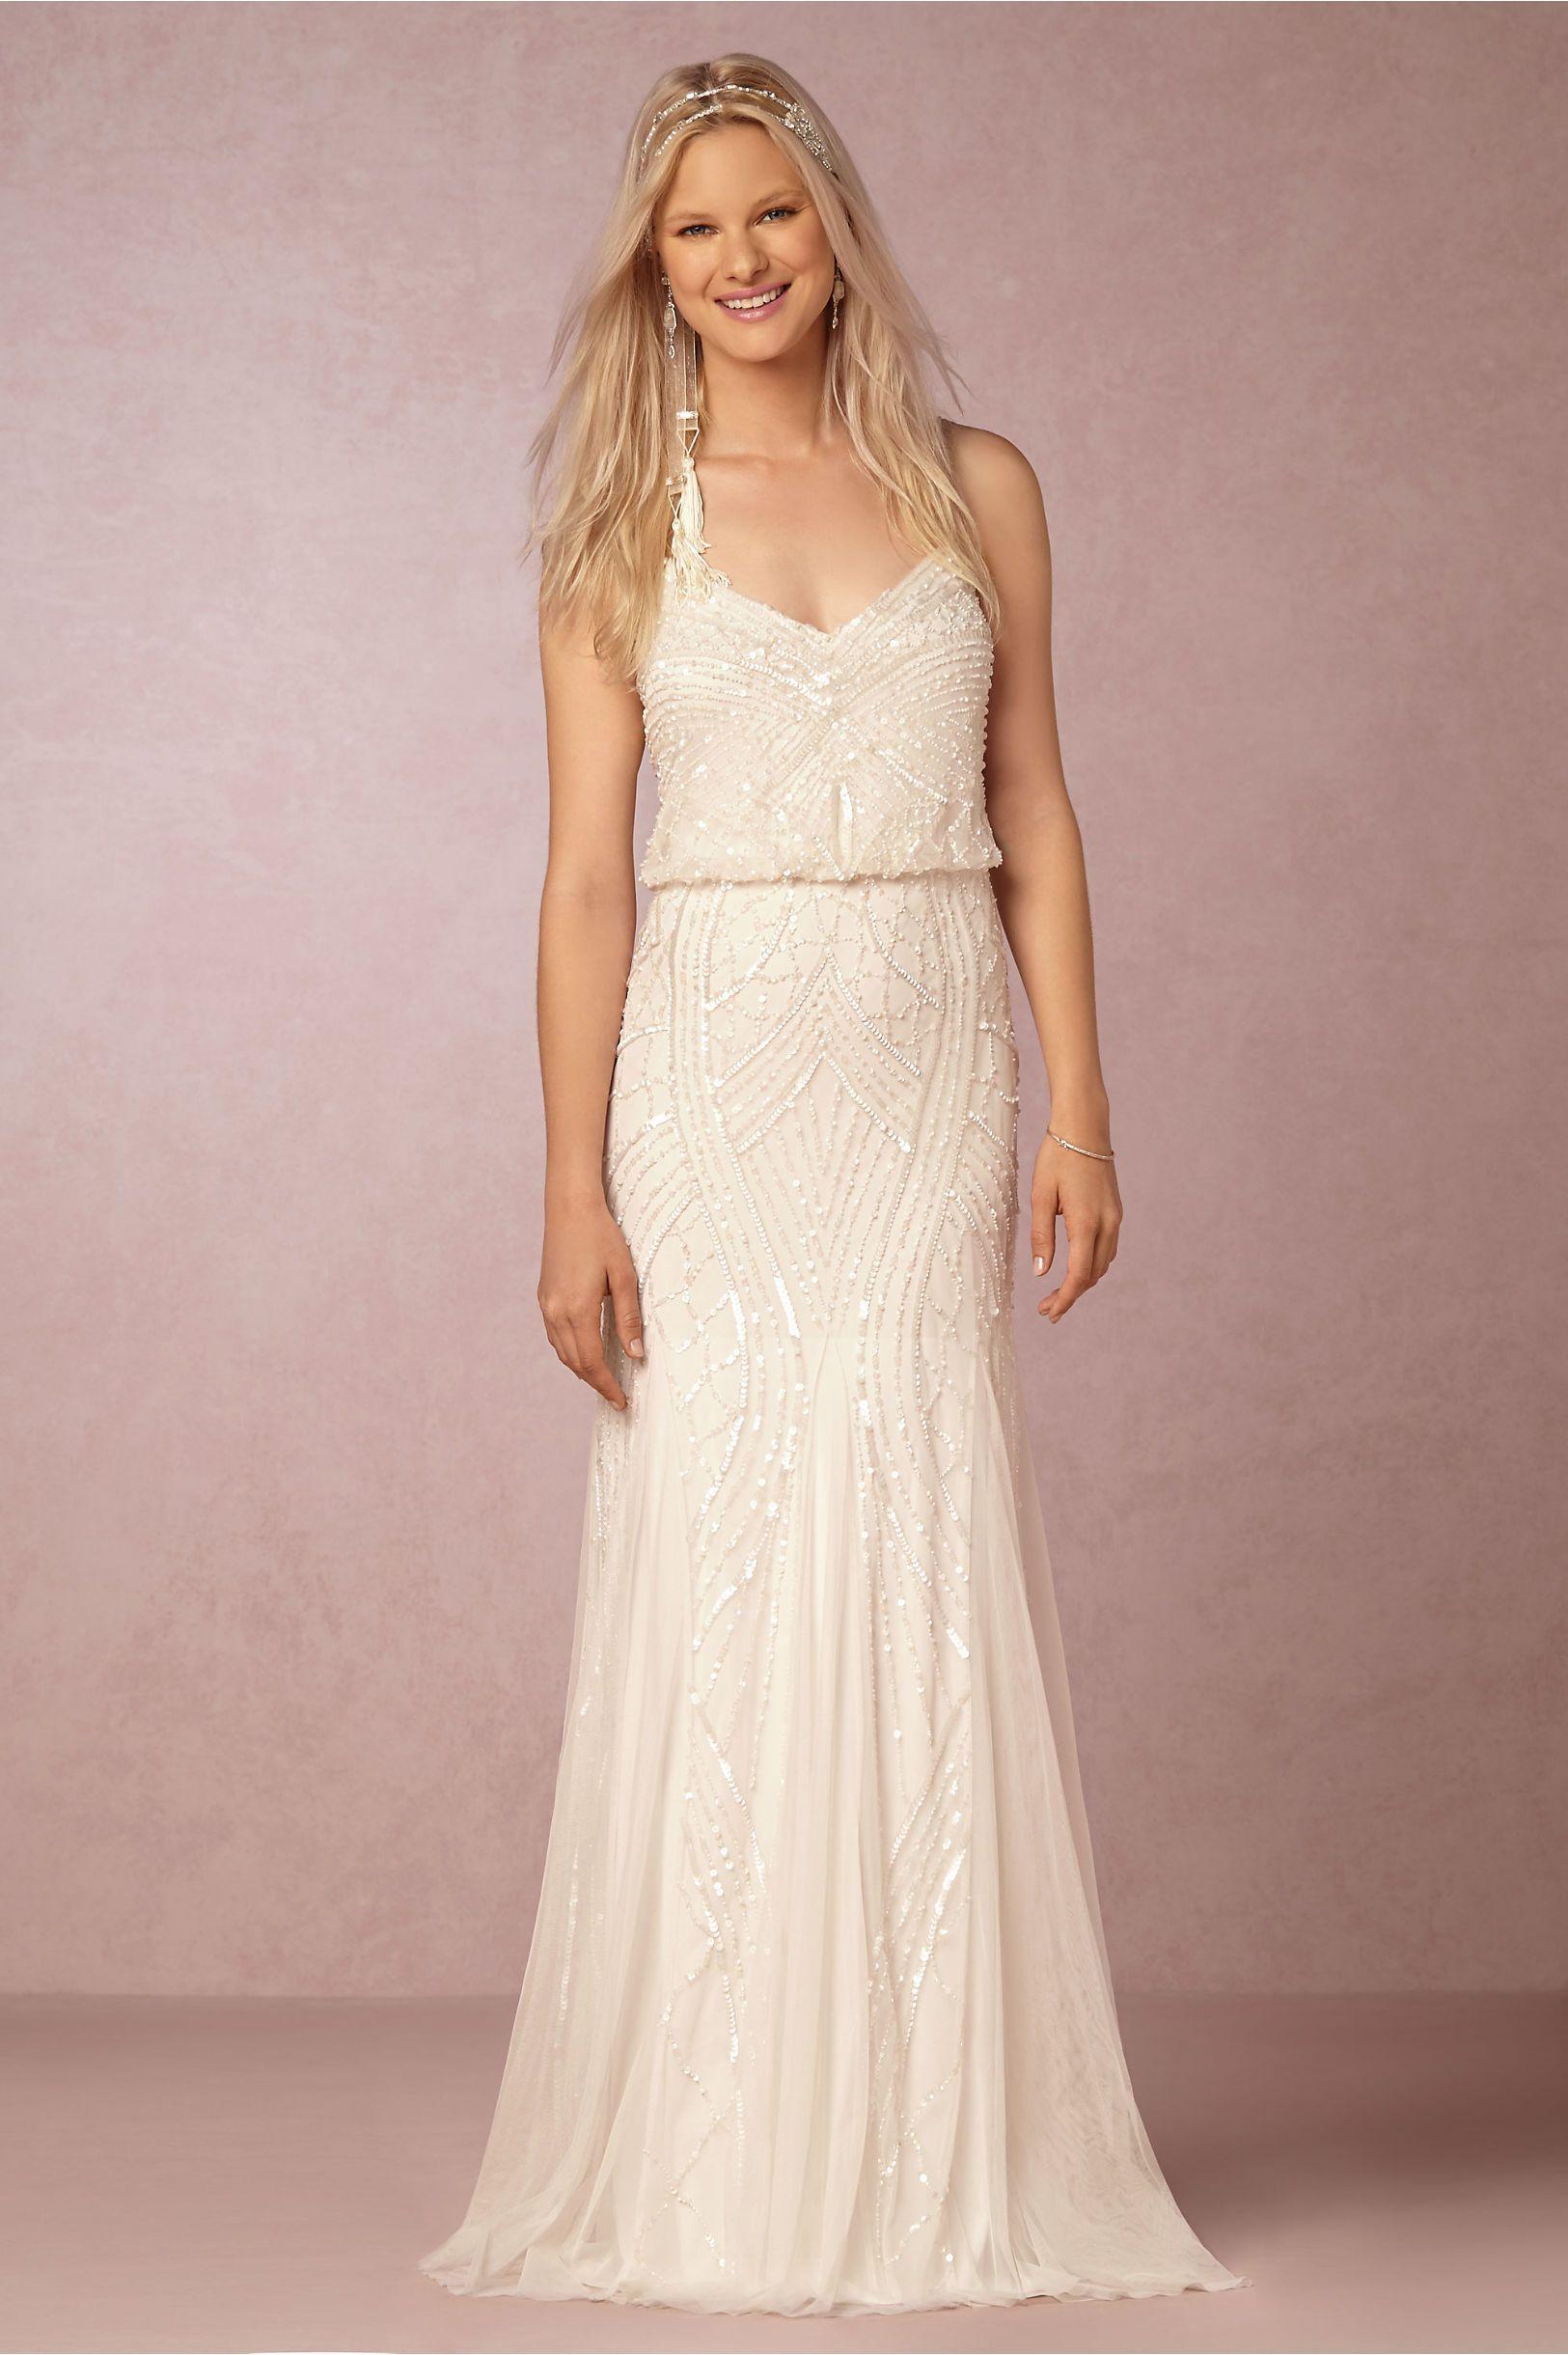 BHLDN Grazia Dress in Bride Reception & Rehearsal Dresses at BHLDN ...